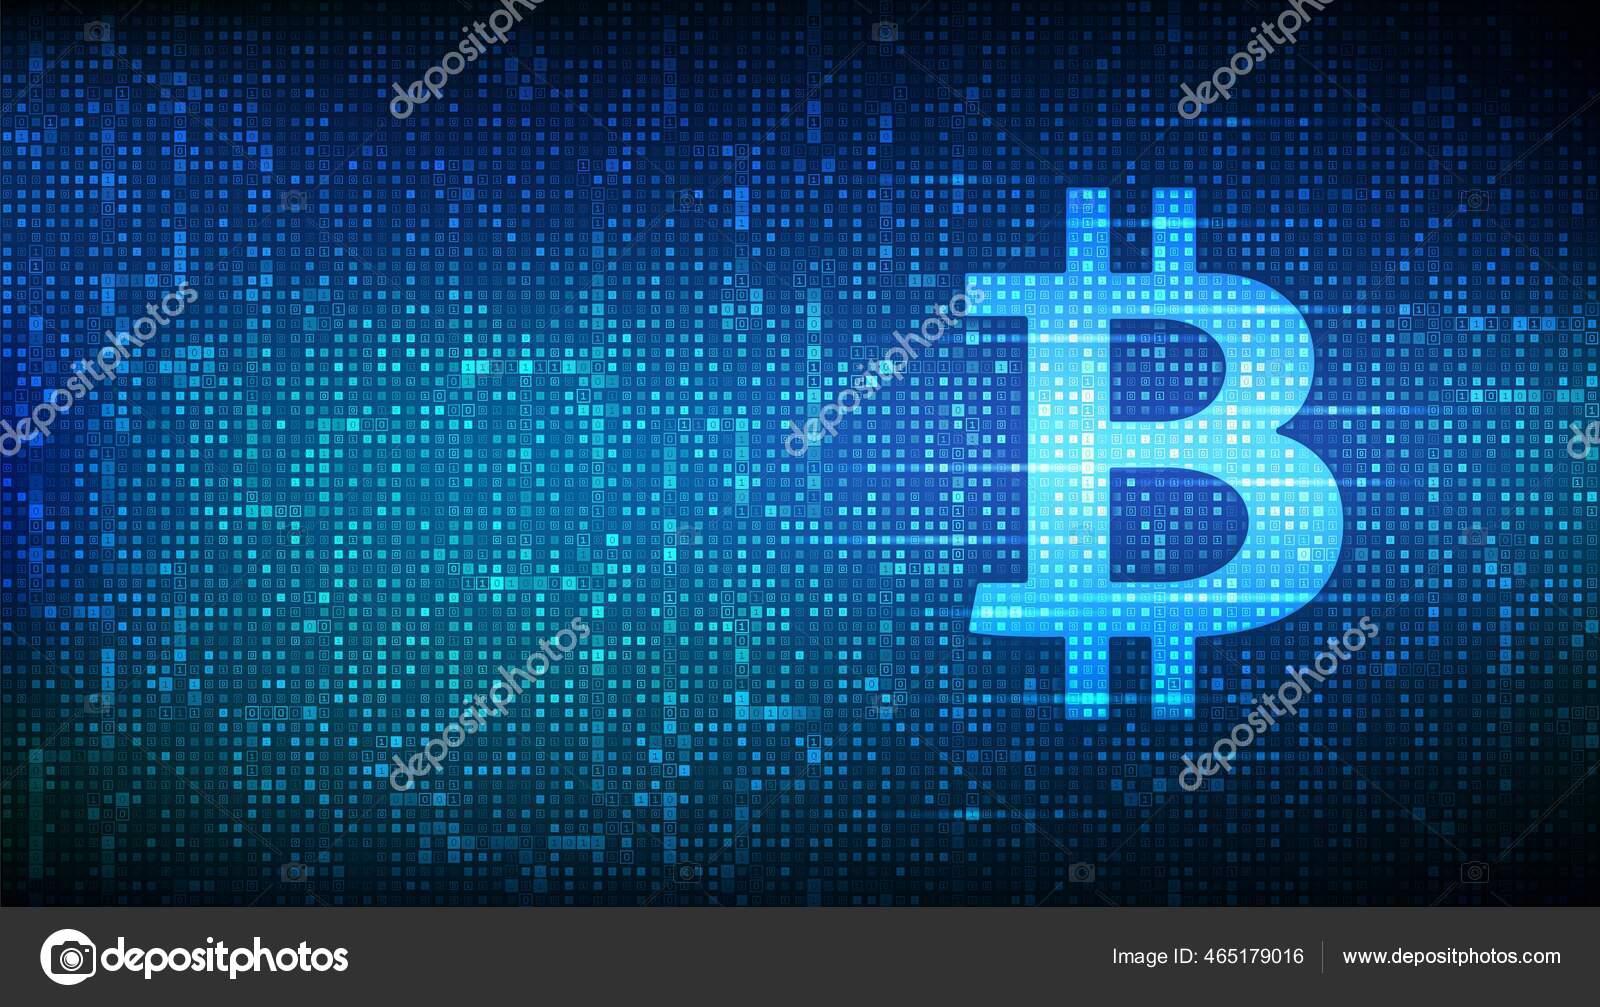 commercio bitcoin binario creatore bitcoin incassa